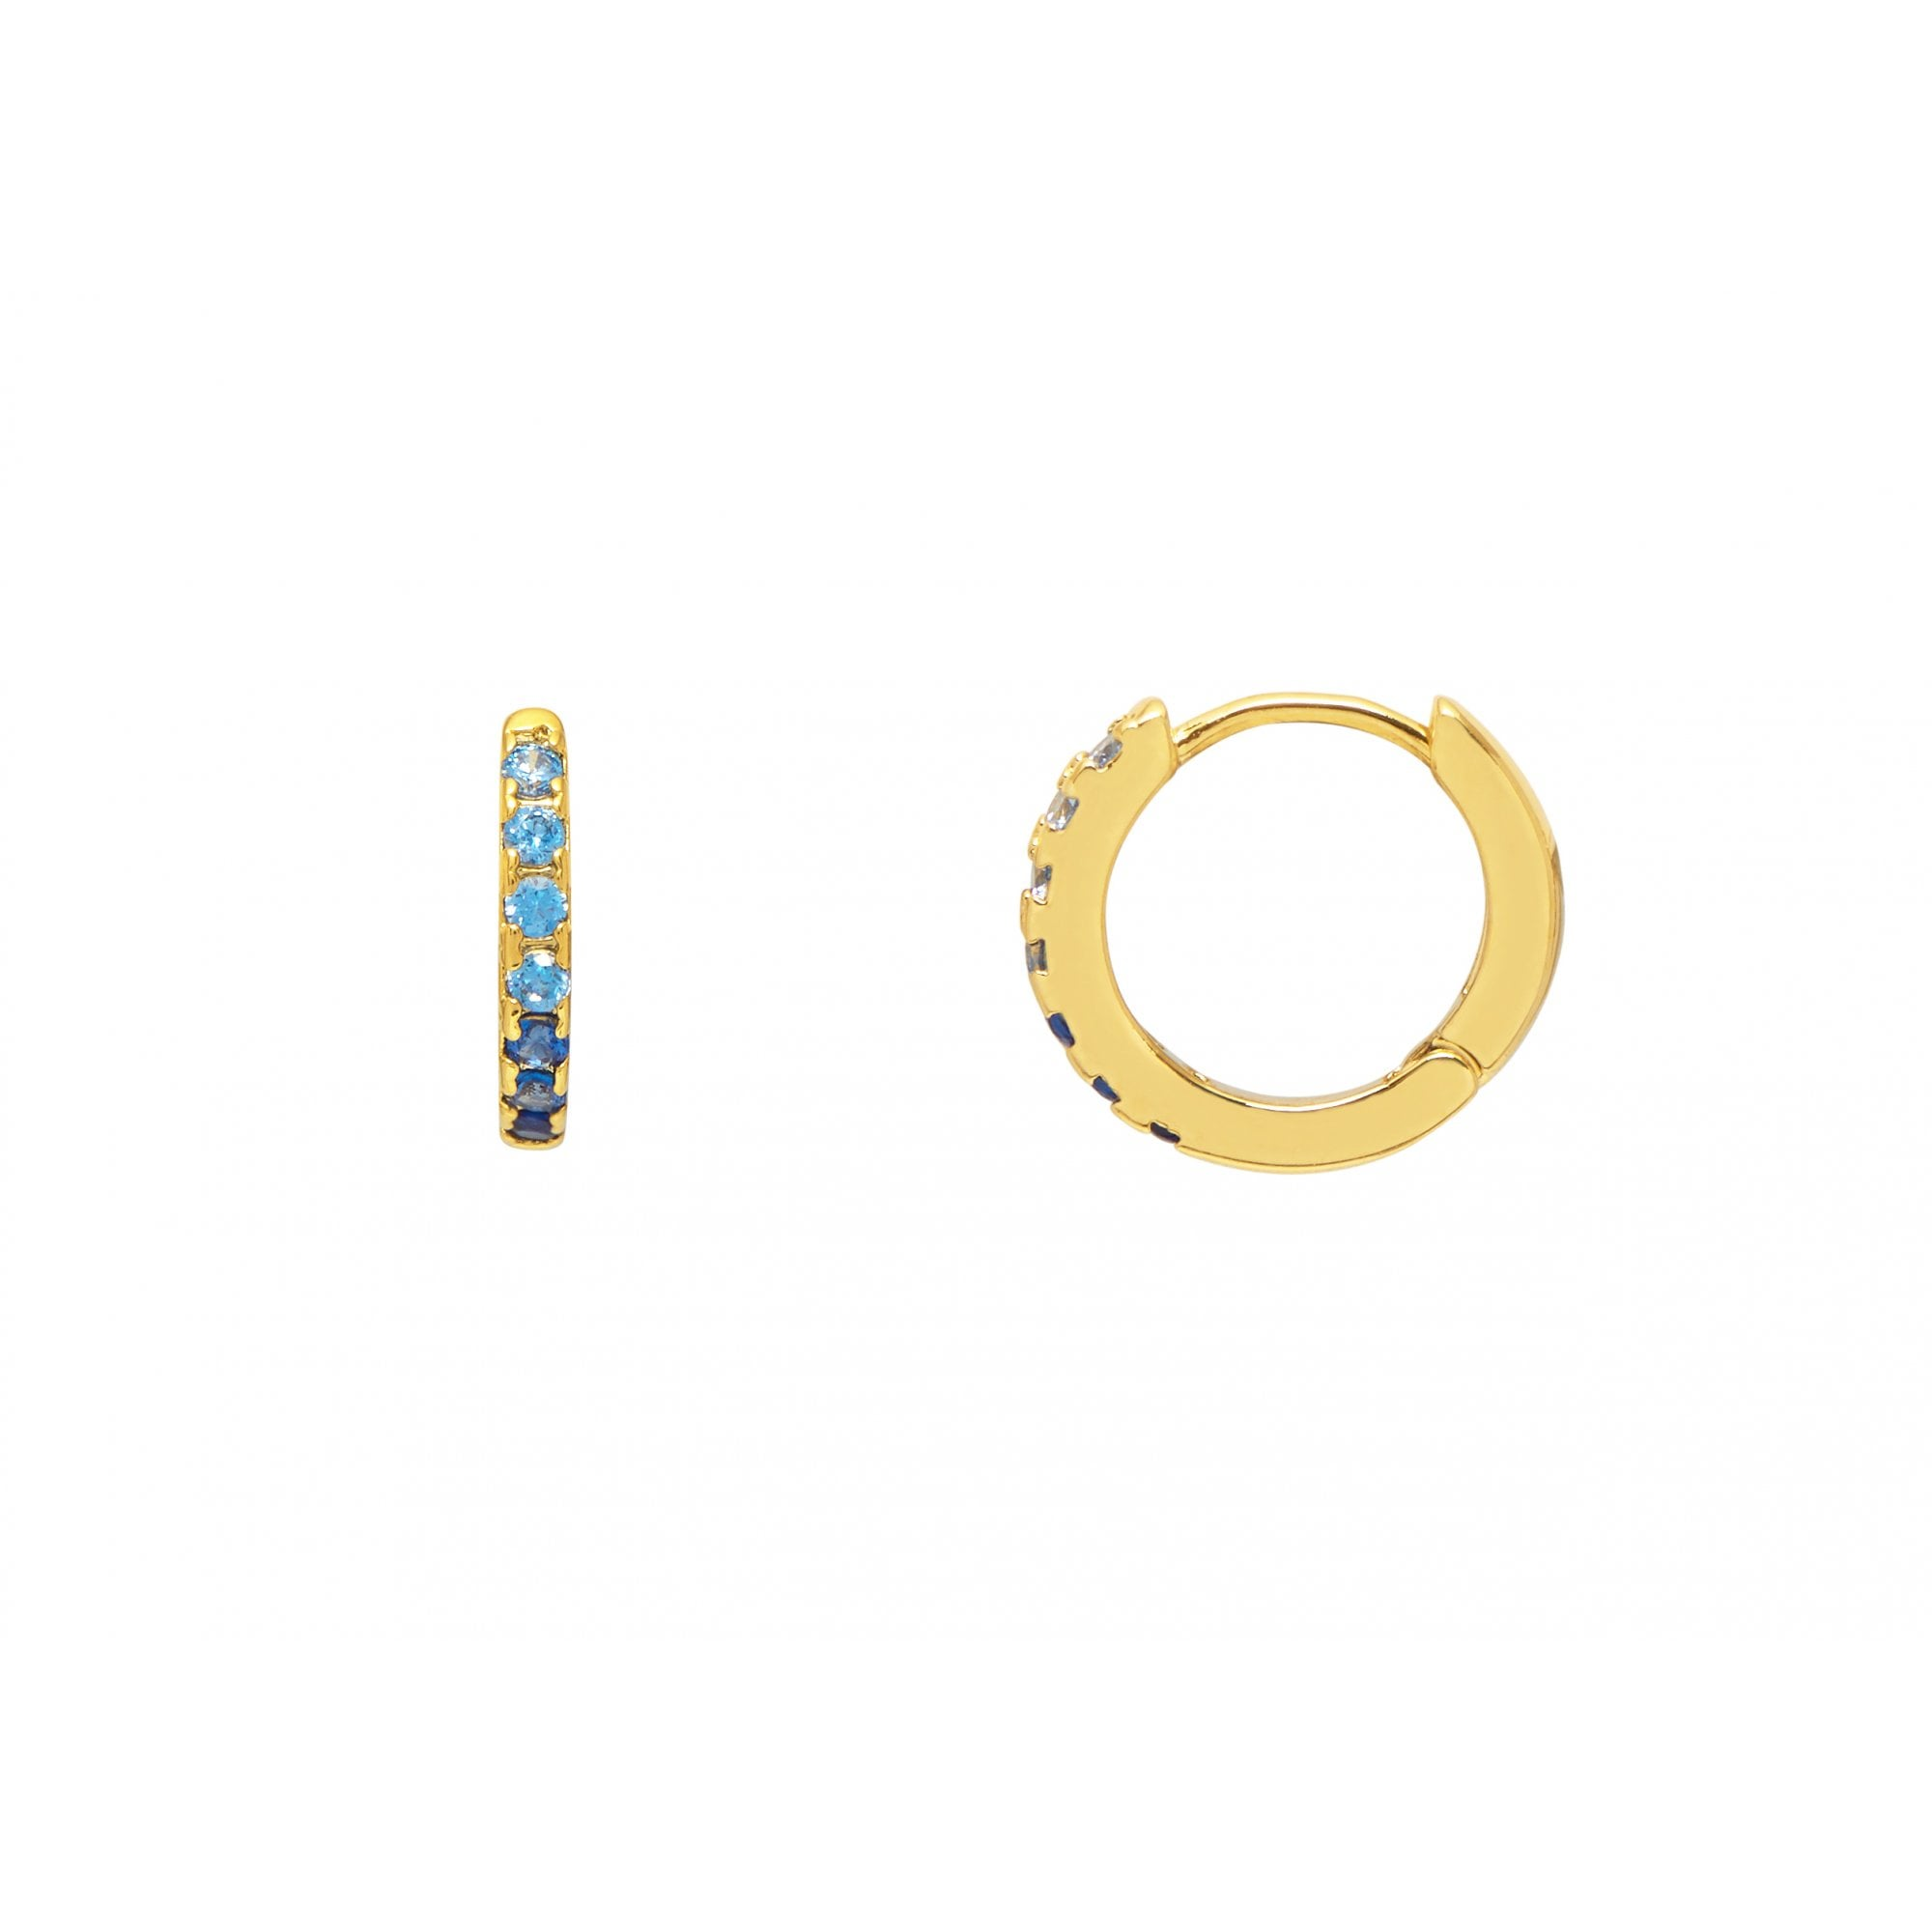 Estella Bartlett Silver-Plated Huggie Hoop Cubic Zirconia Earrings